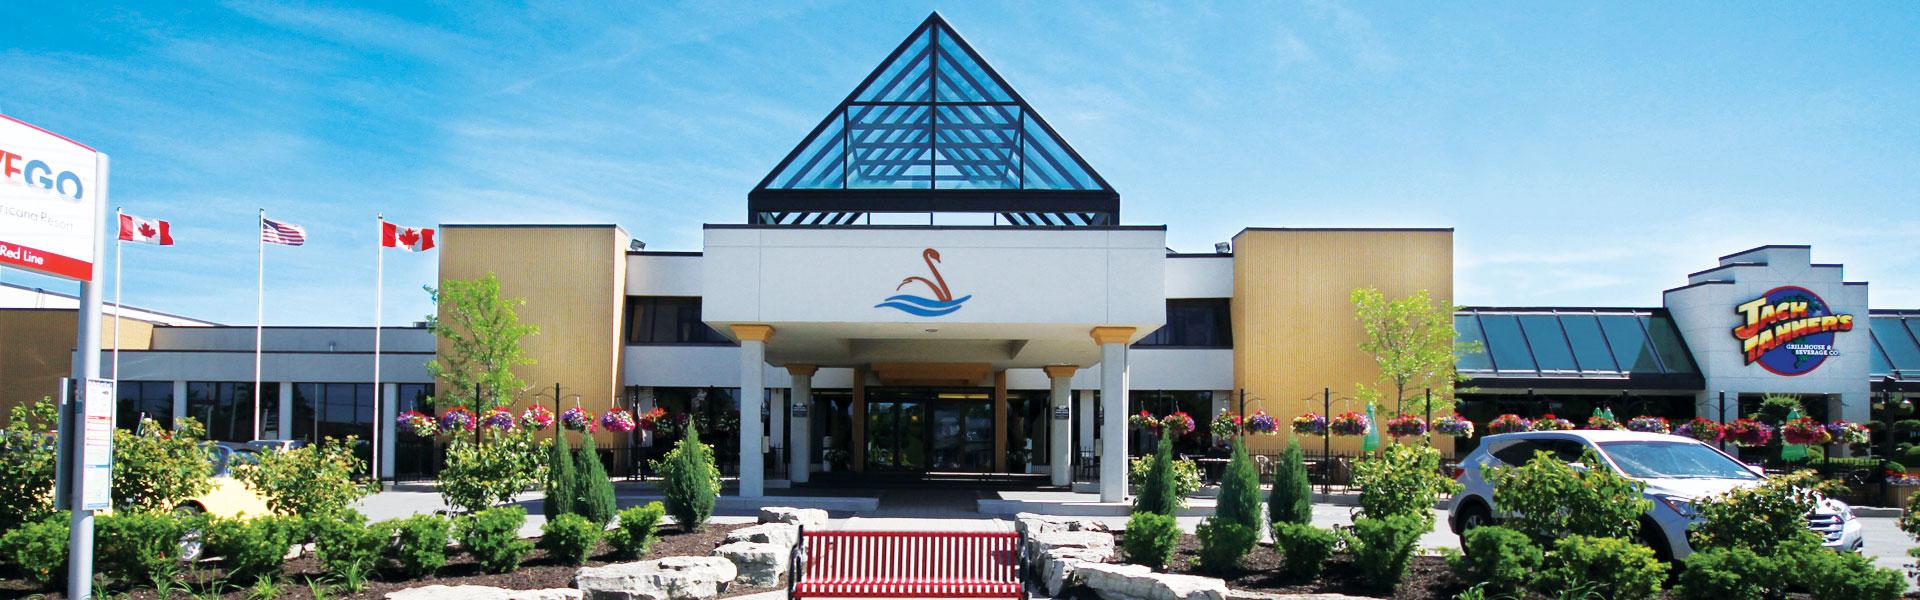 americana-hotel-entrance